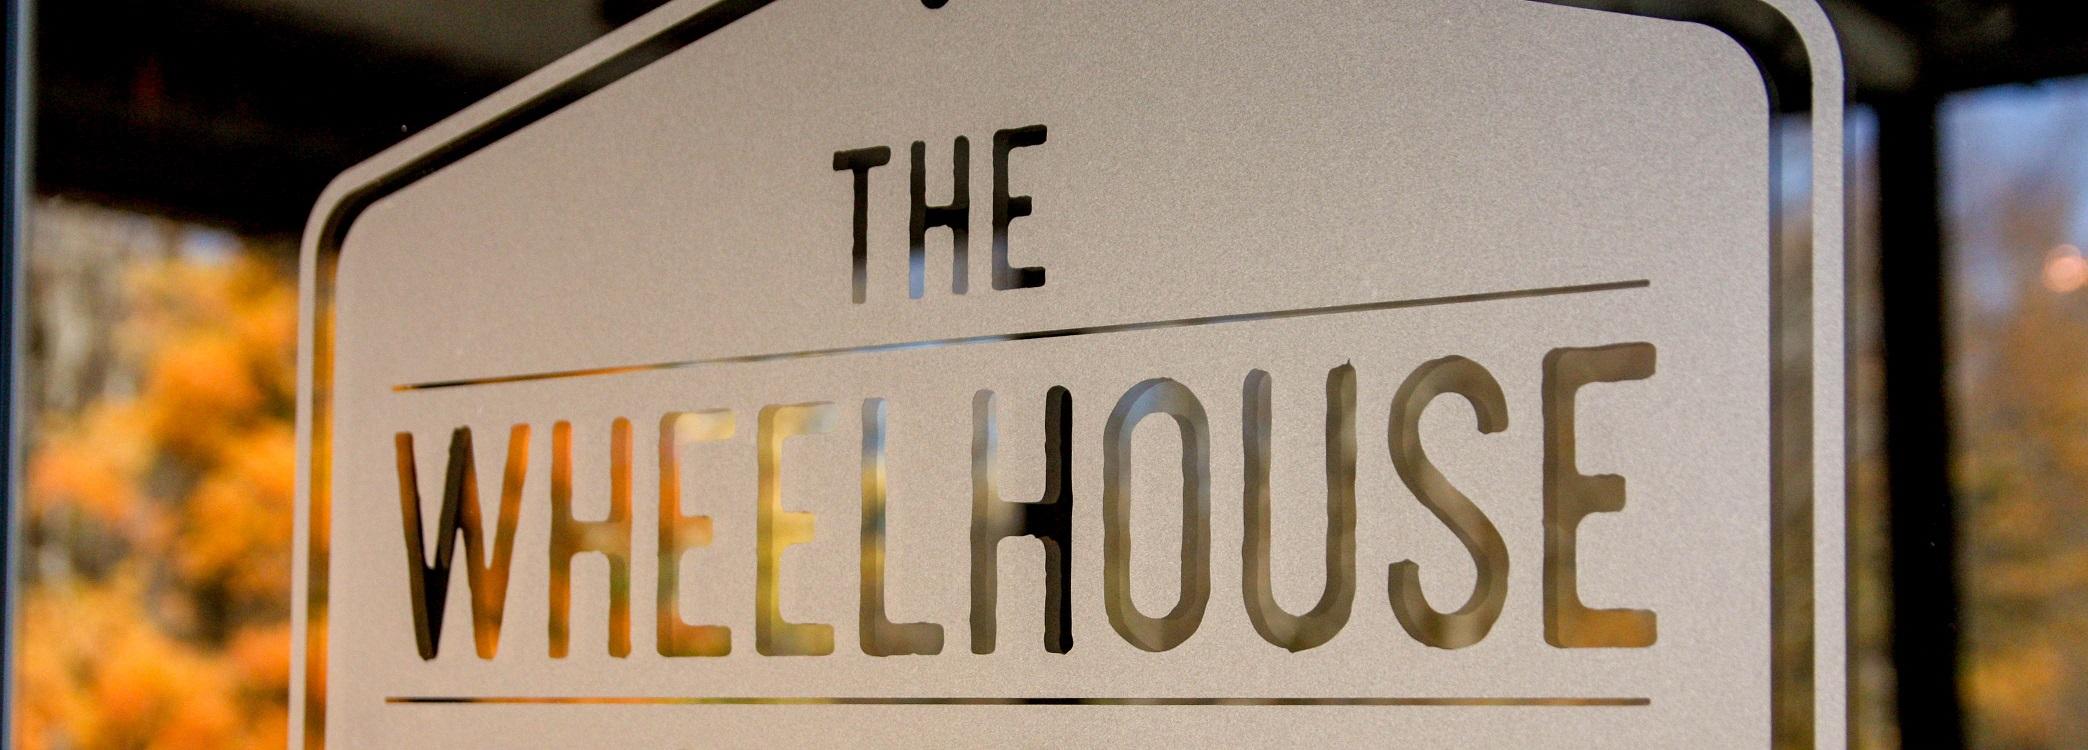 Wheelhouse Logo Cropped.jpg